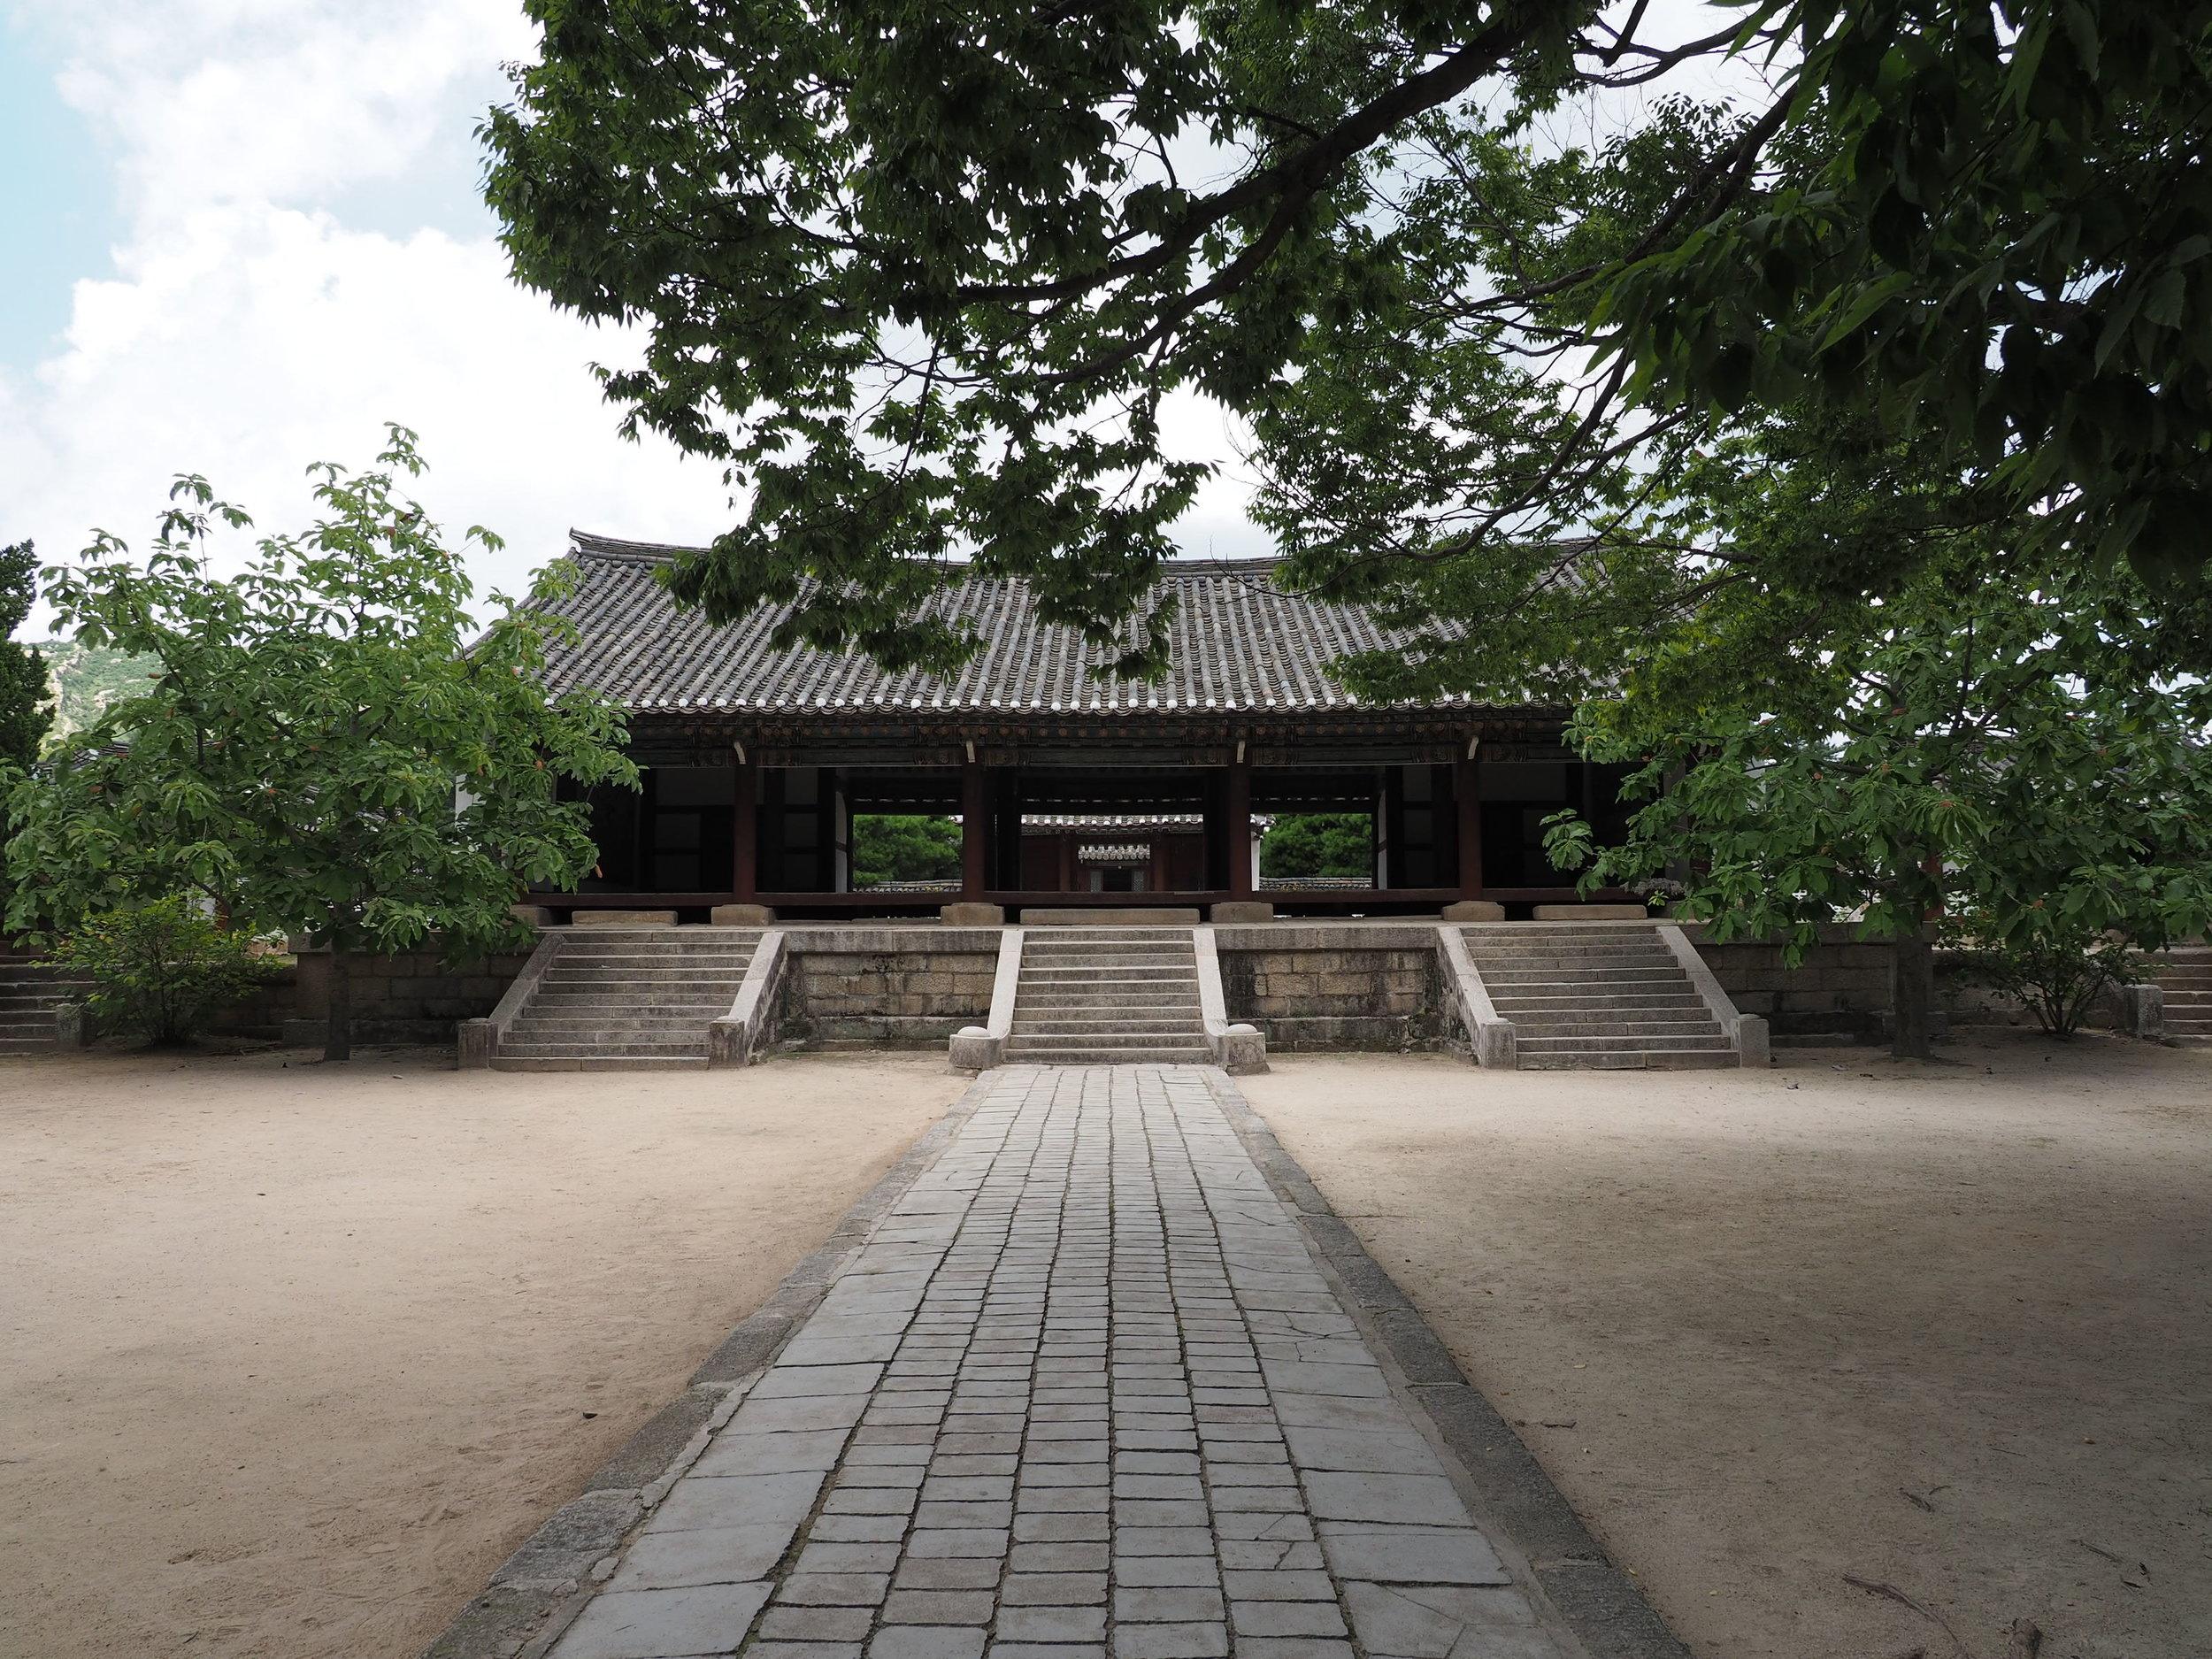 Entrance to the Koryo History Museum